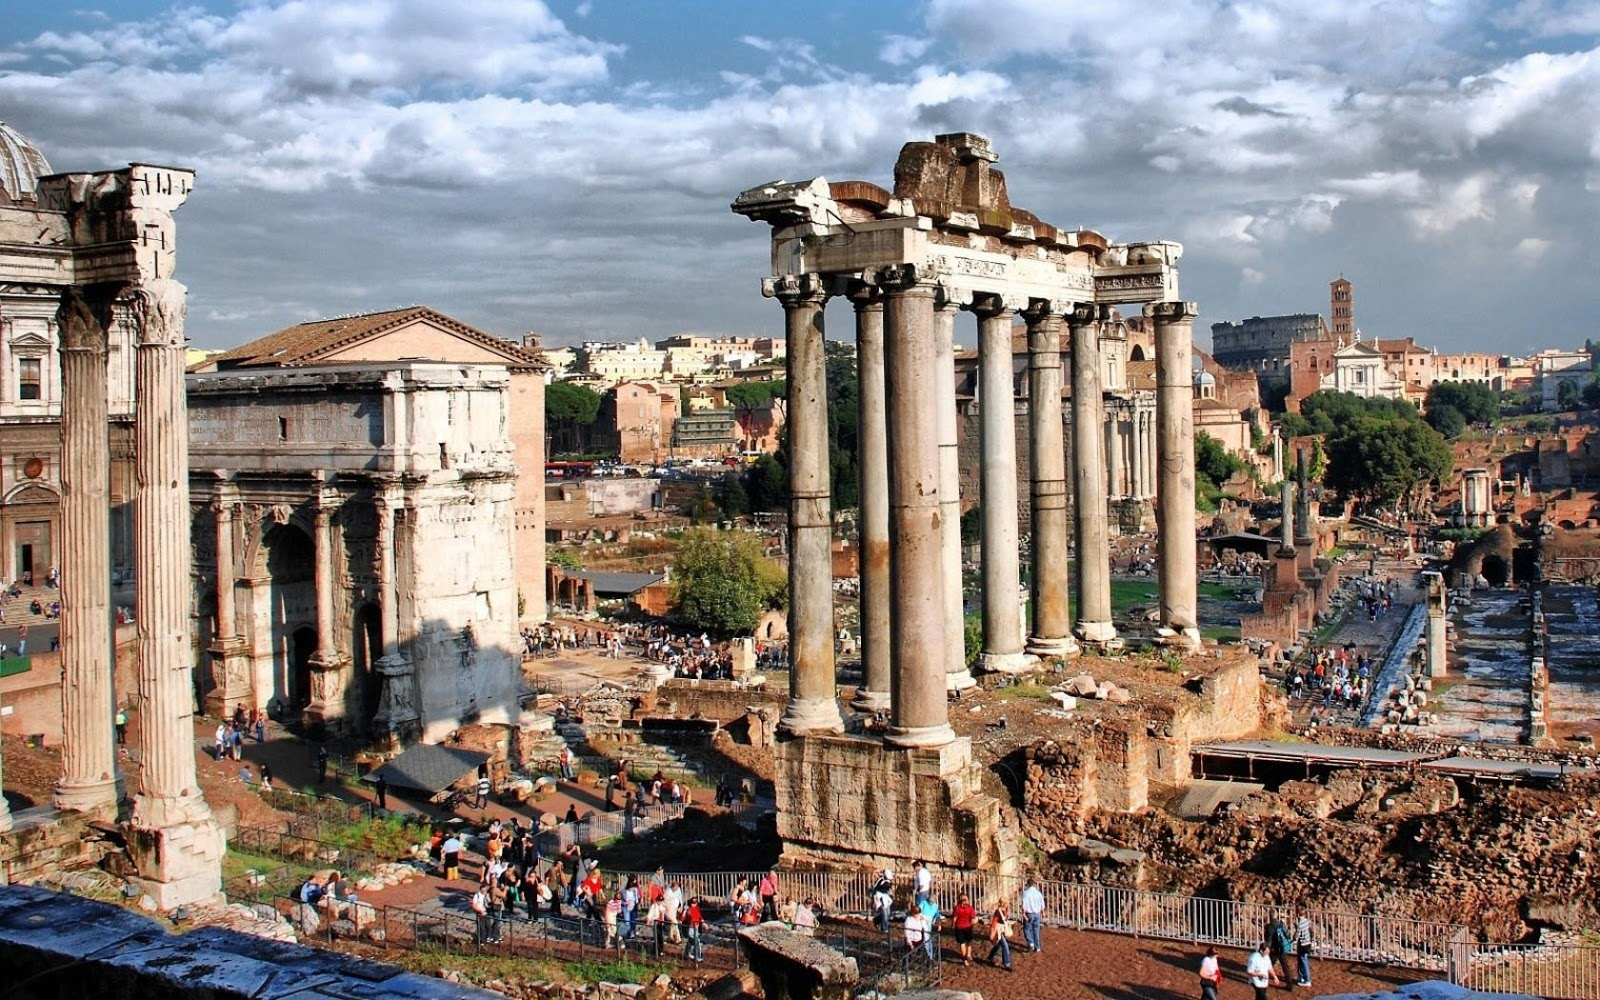 HD Wallpapers Desktop Italy Country HD DeskTop Wallpapers 1600x1000